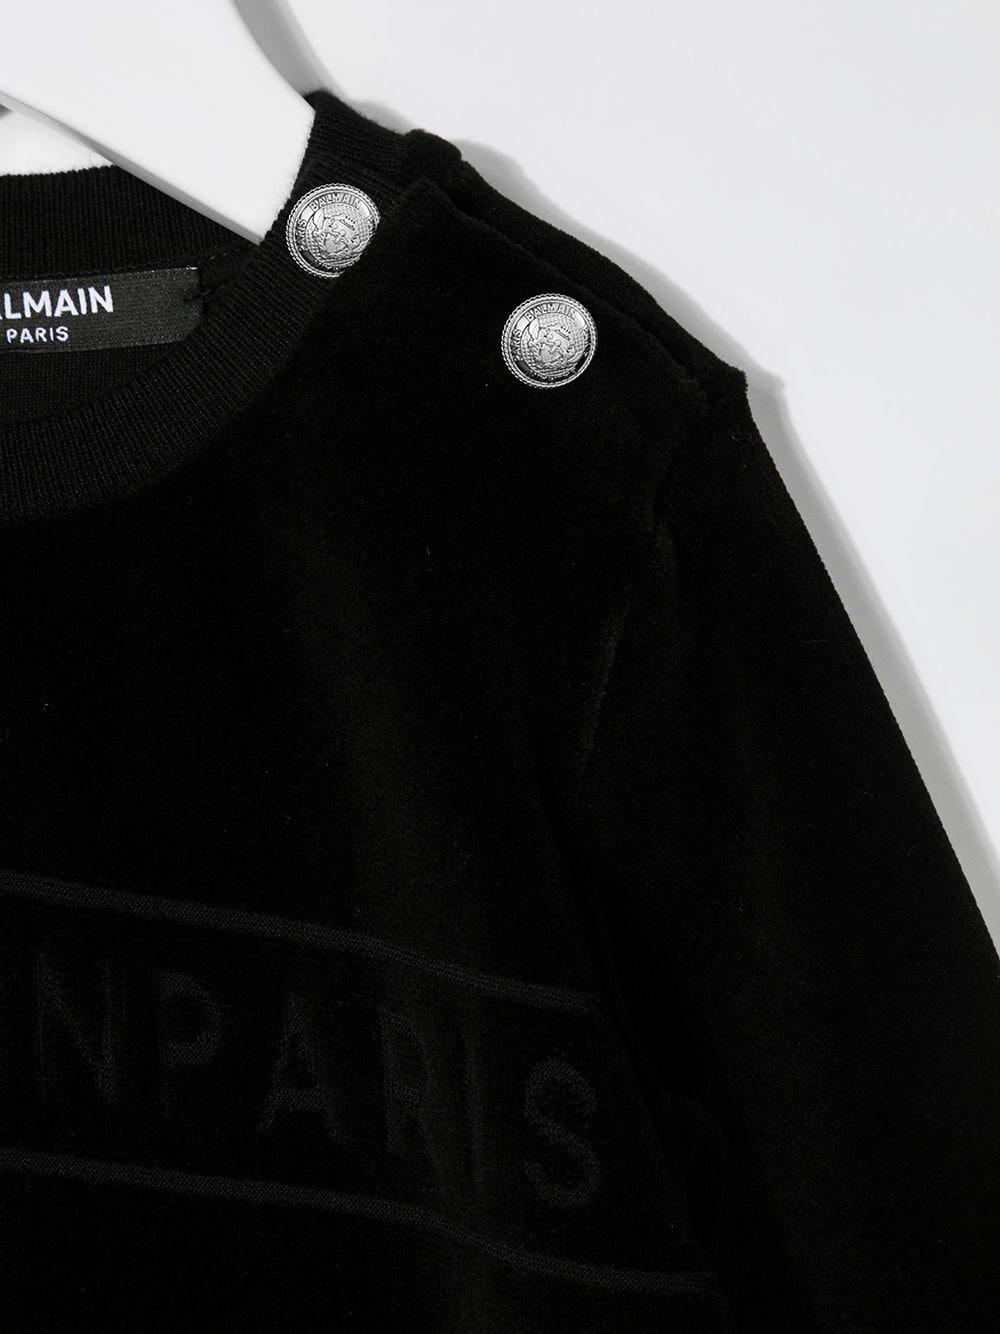 felpa balmain in velluto con scritta logo Balmain | Felpa | 6N4830NB430930